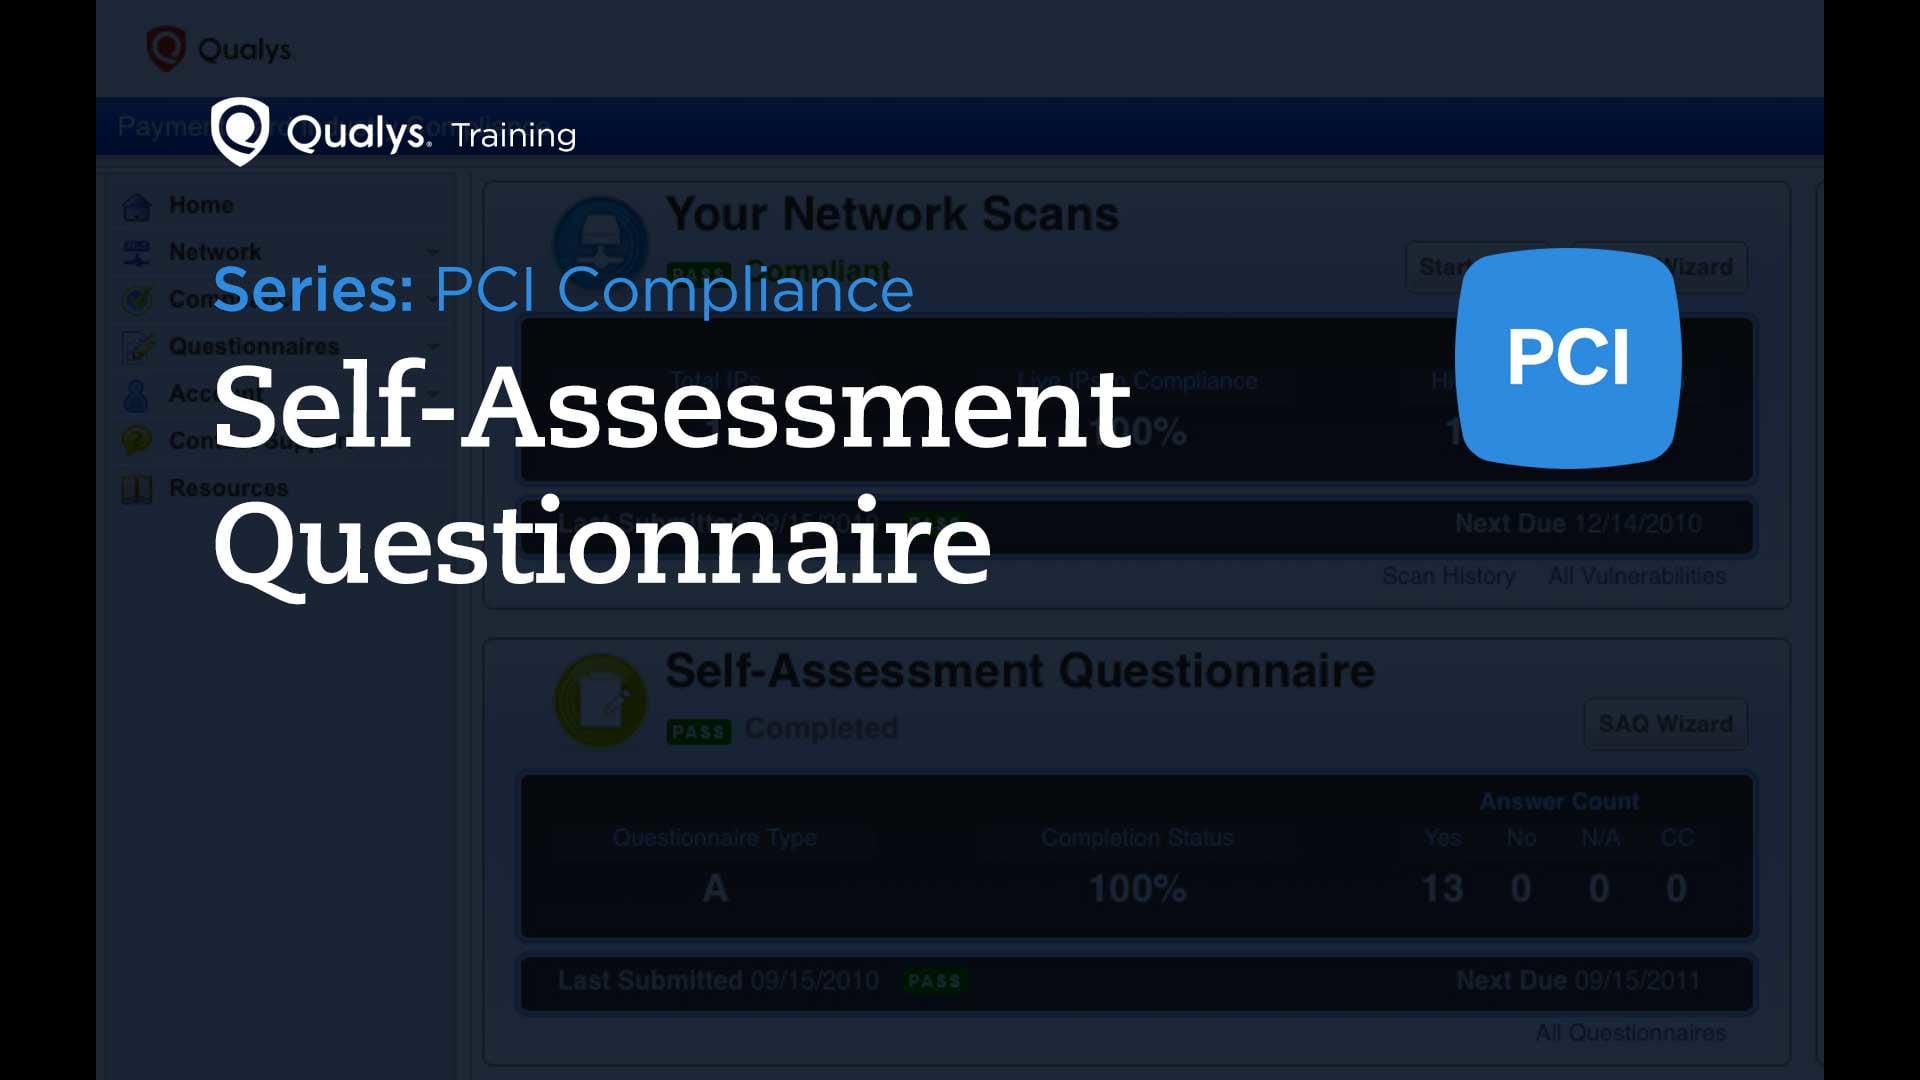 Self-Assessment Questionnaire